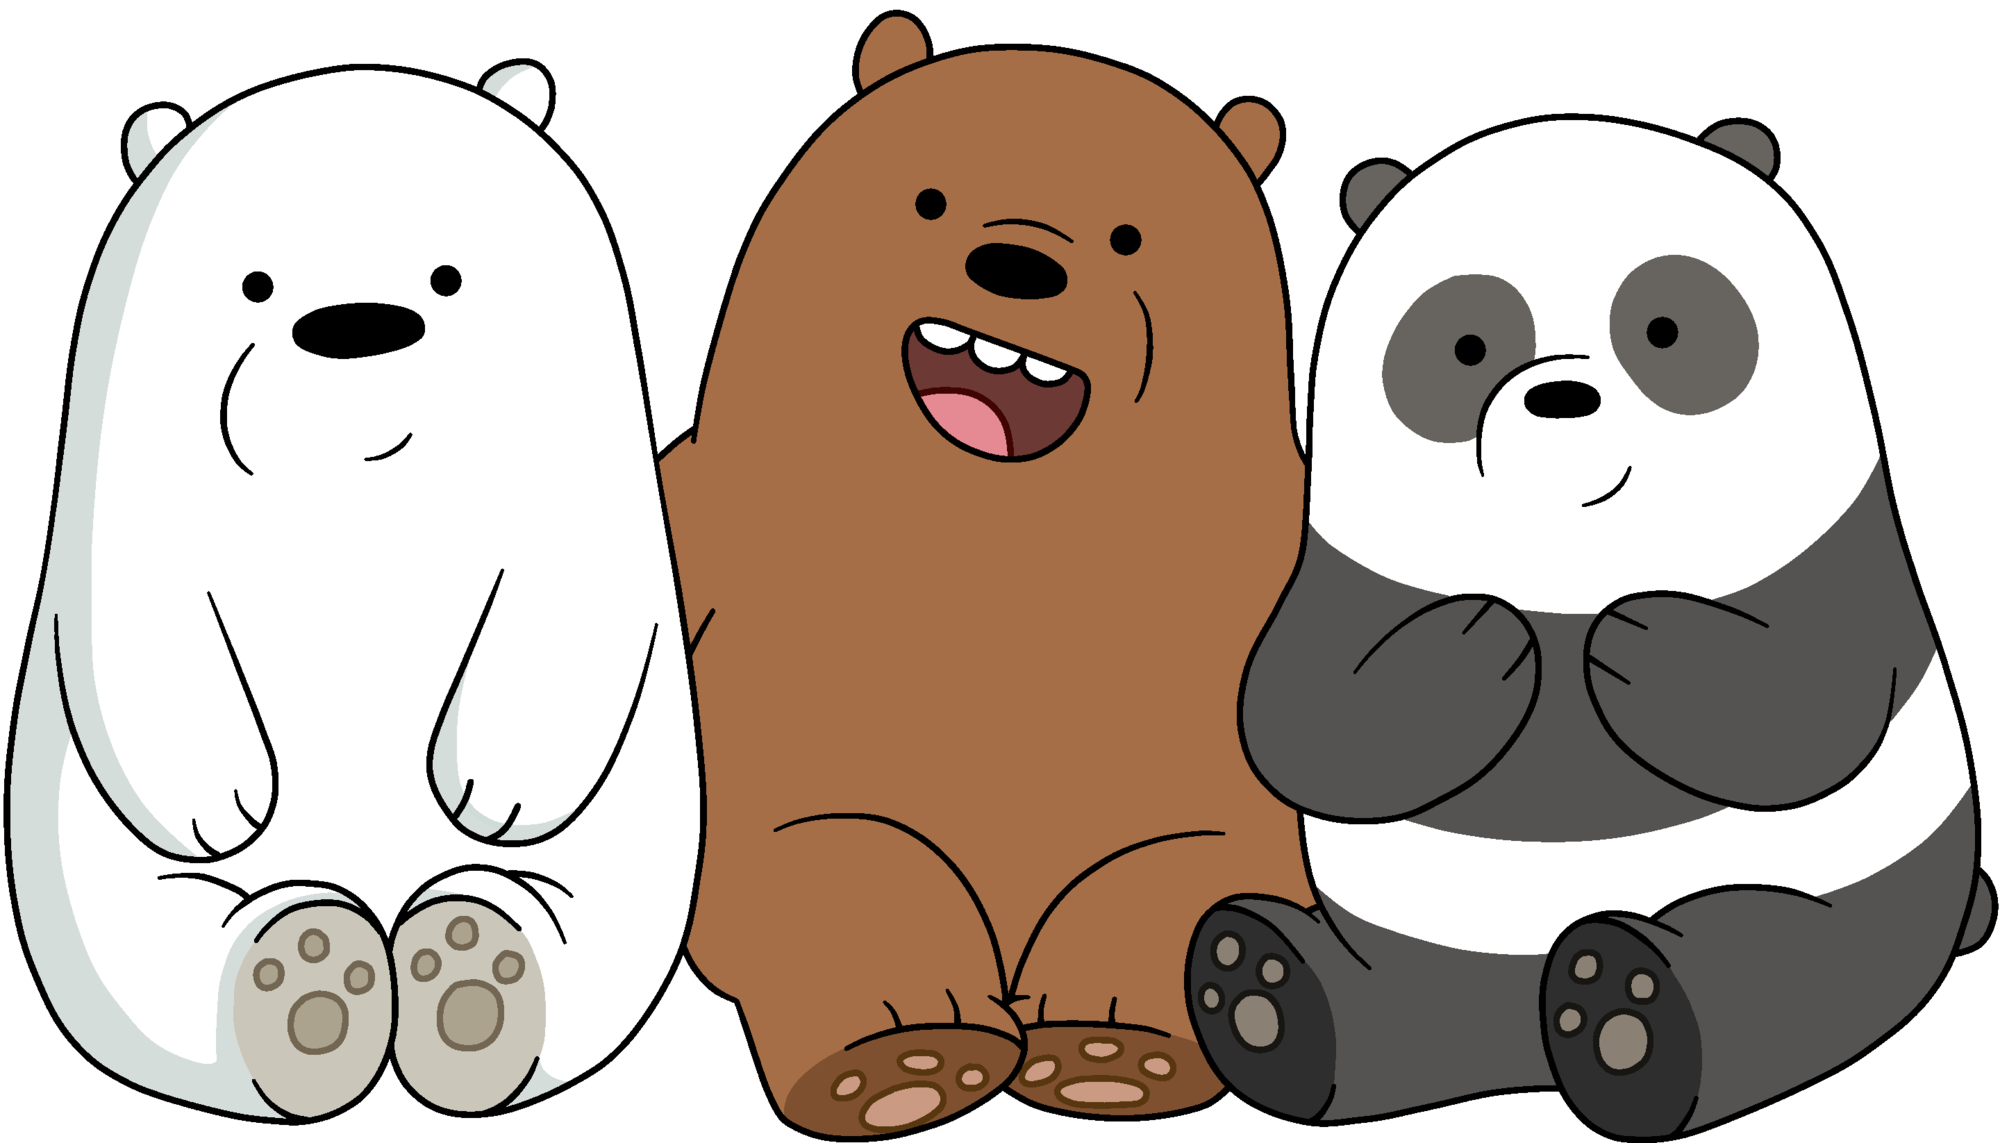 Image cubs png we. Clipart bear bear cub